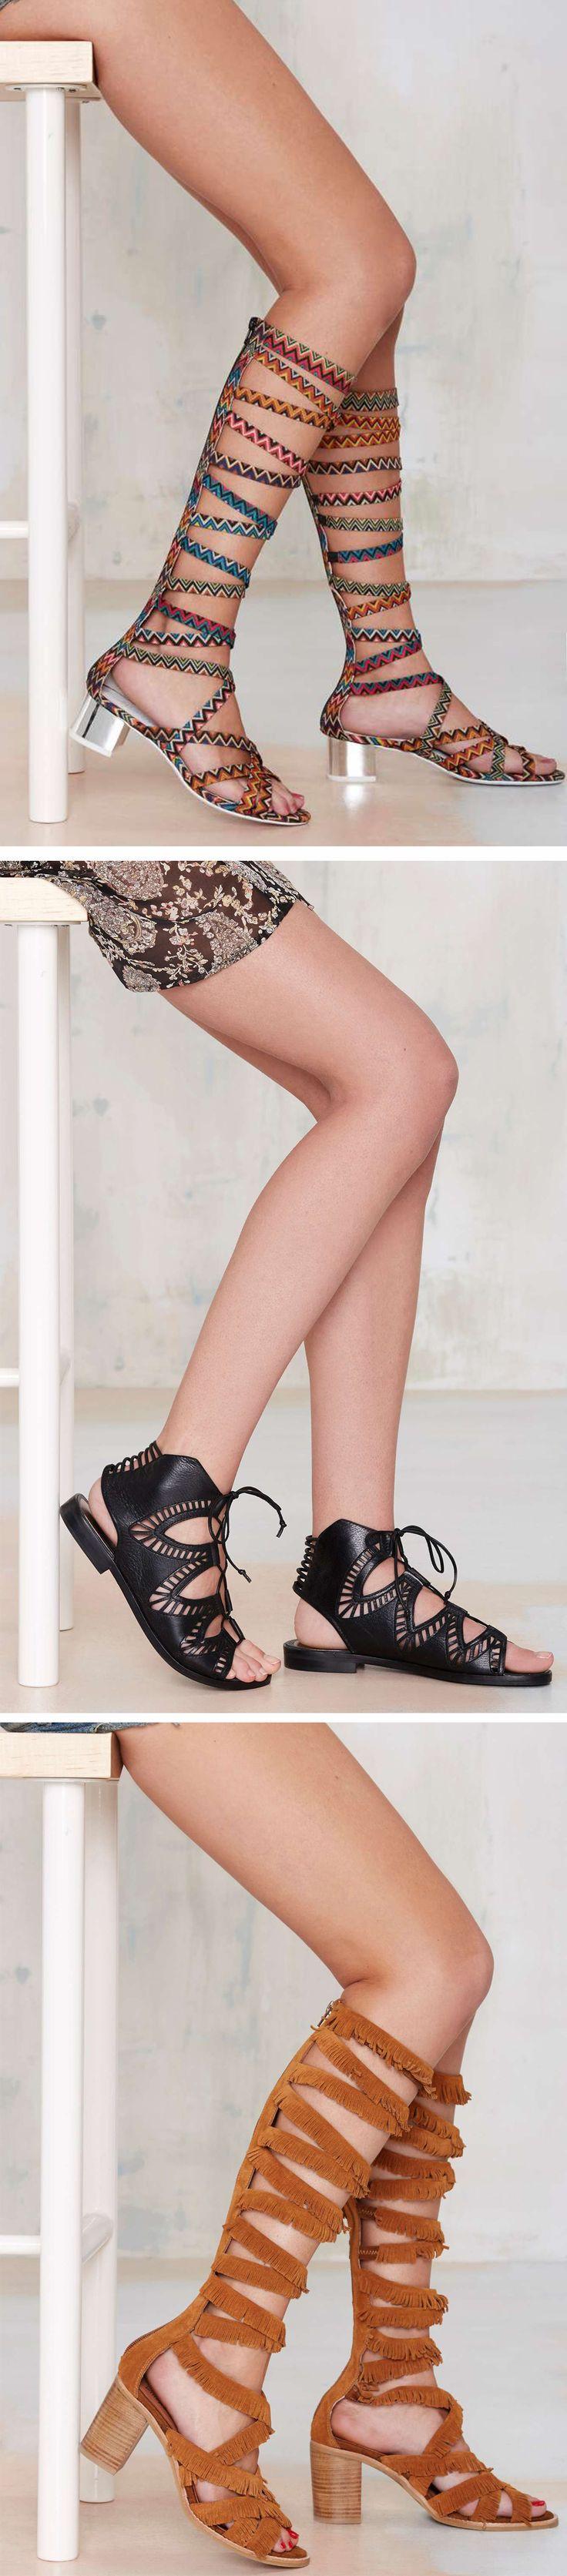 best 25+ long gladiator sandals ideas on pinterest | gladiators